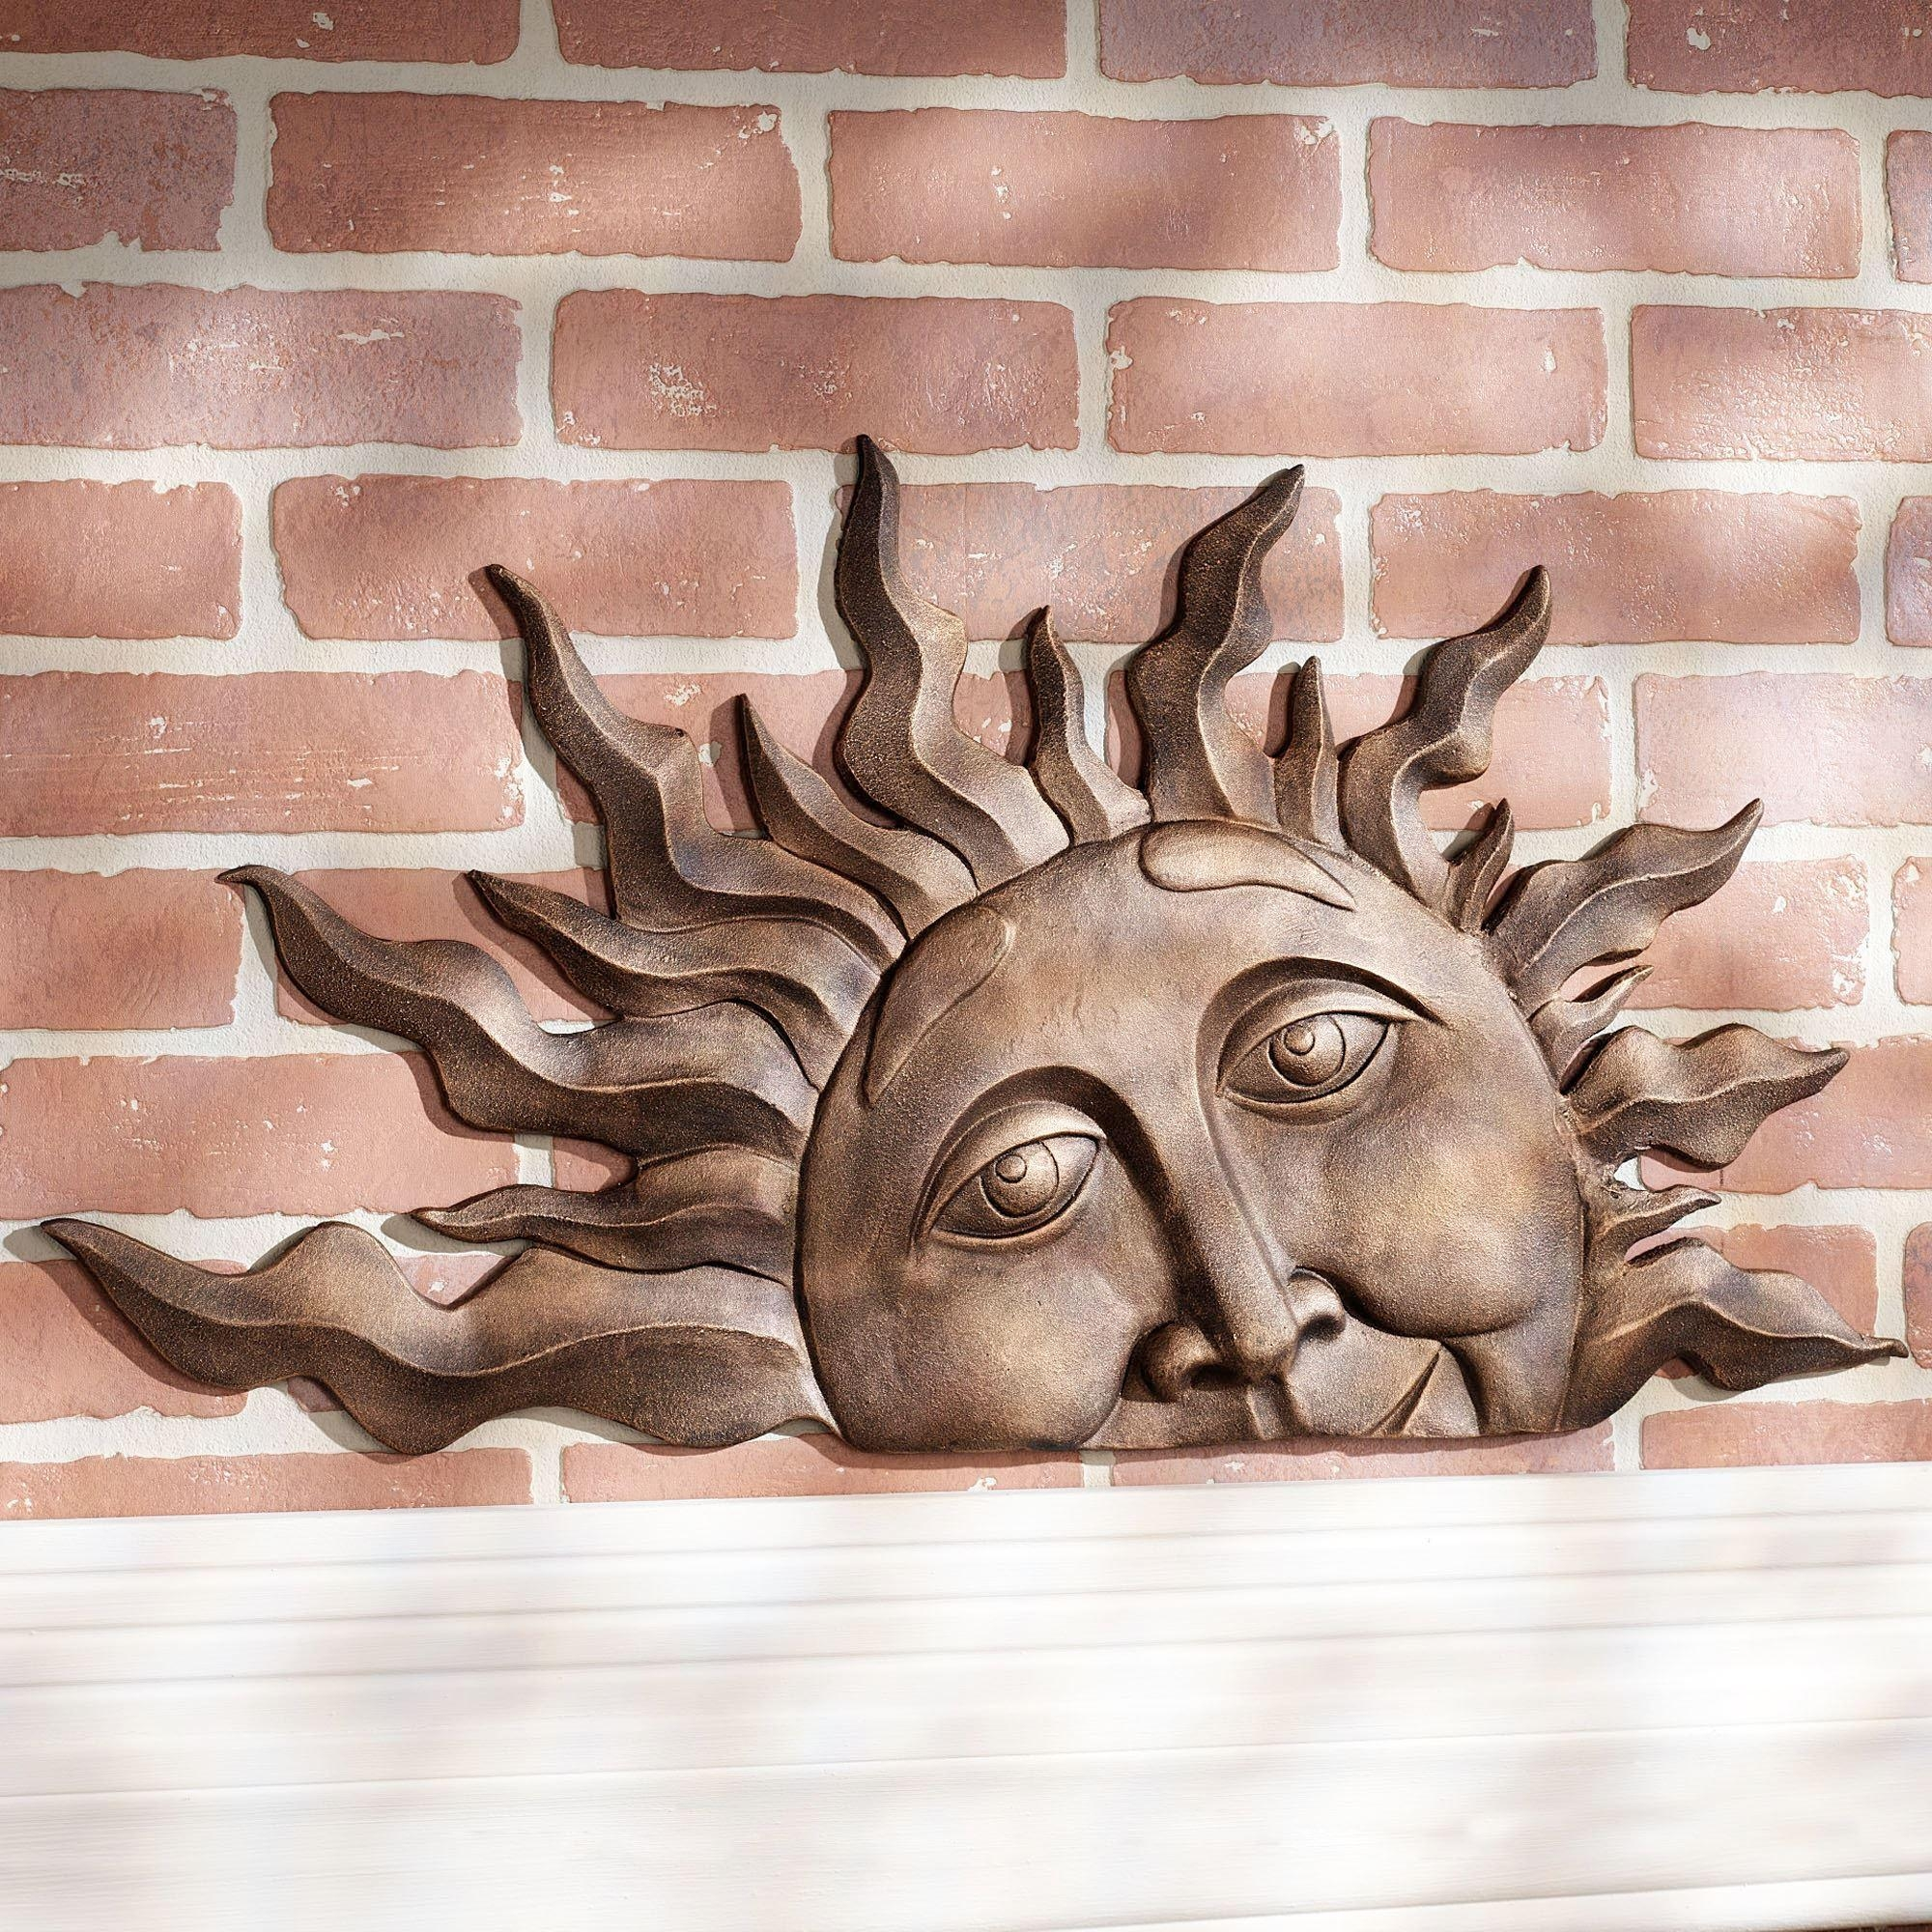 Half Sun Face Indoor Outdoor Metal Wall Plaque Art Intended For Outdoor Wall Sculpture Art (Image 6 of 20)